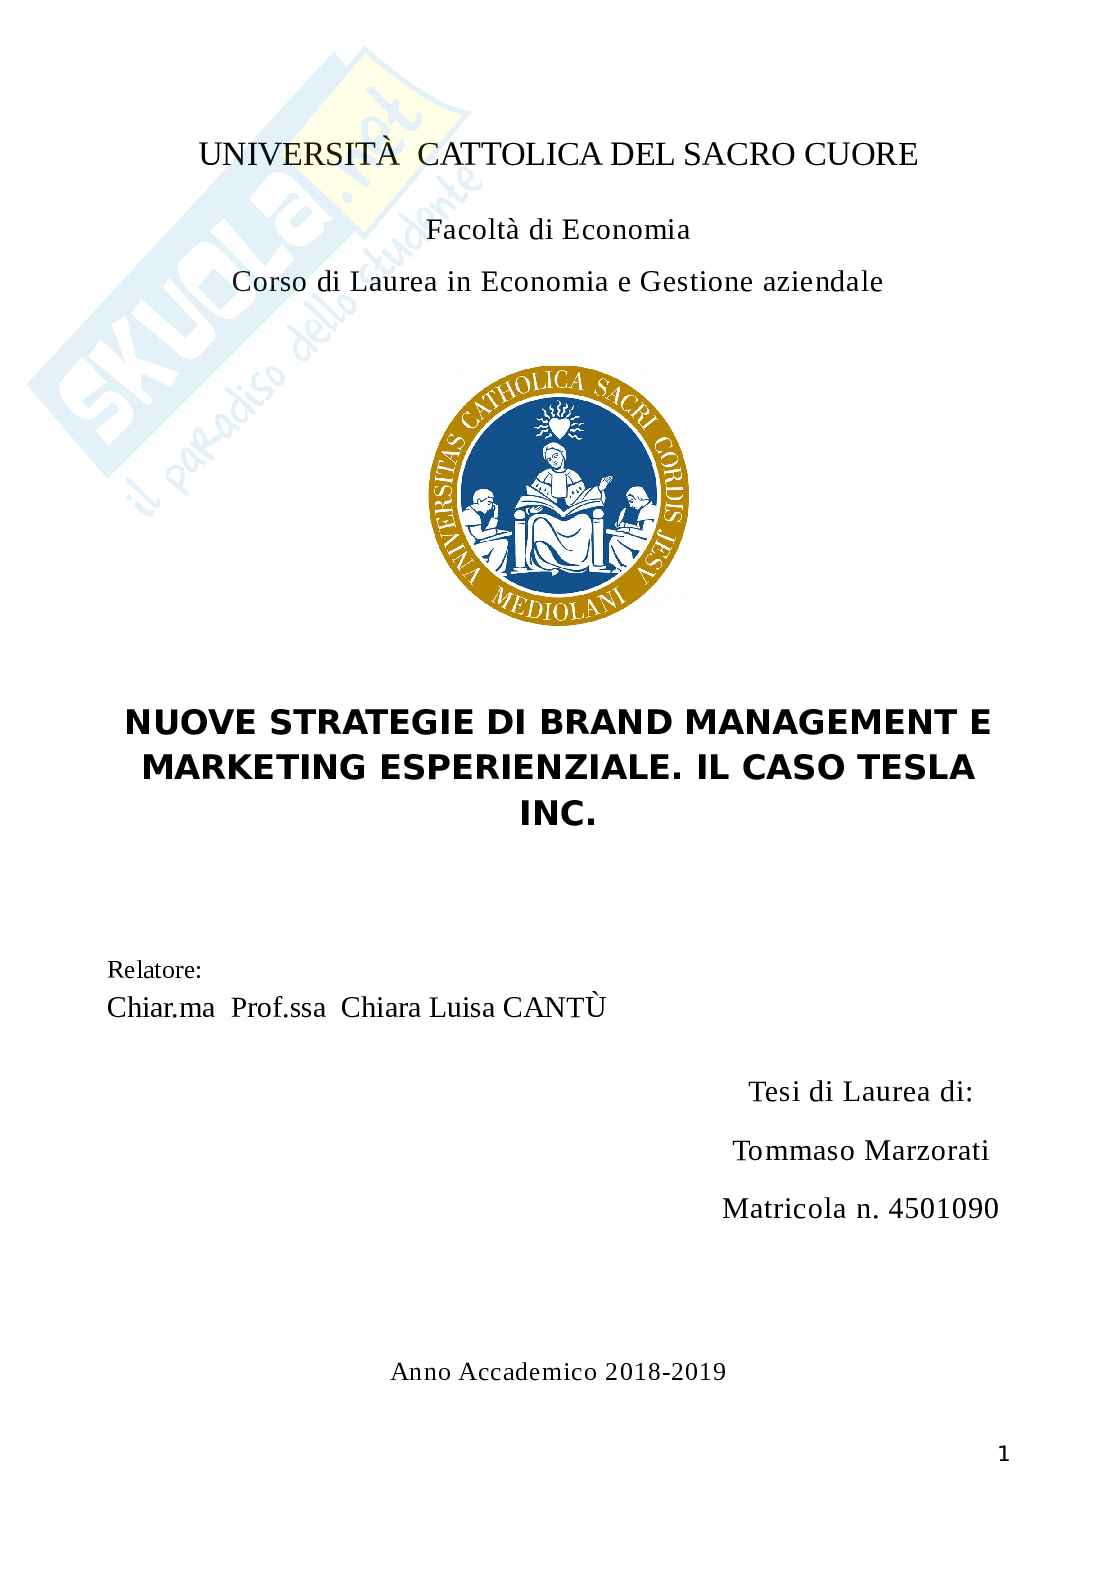 Il Marketing esperienziale e Brand Management: il caso Tesla - Tesi Laurea triennale Marketing